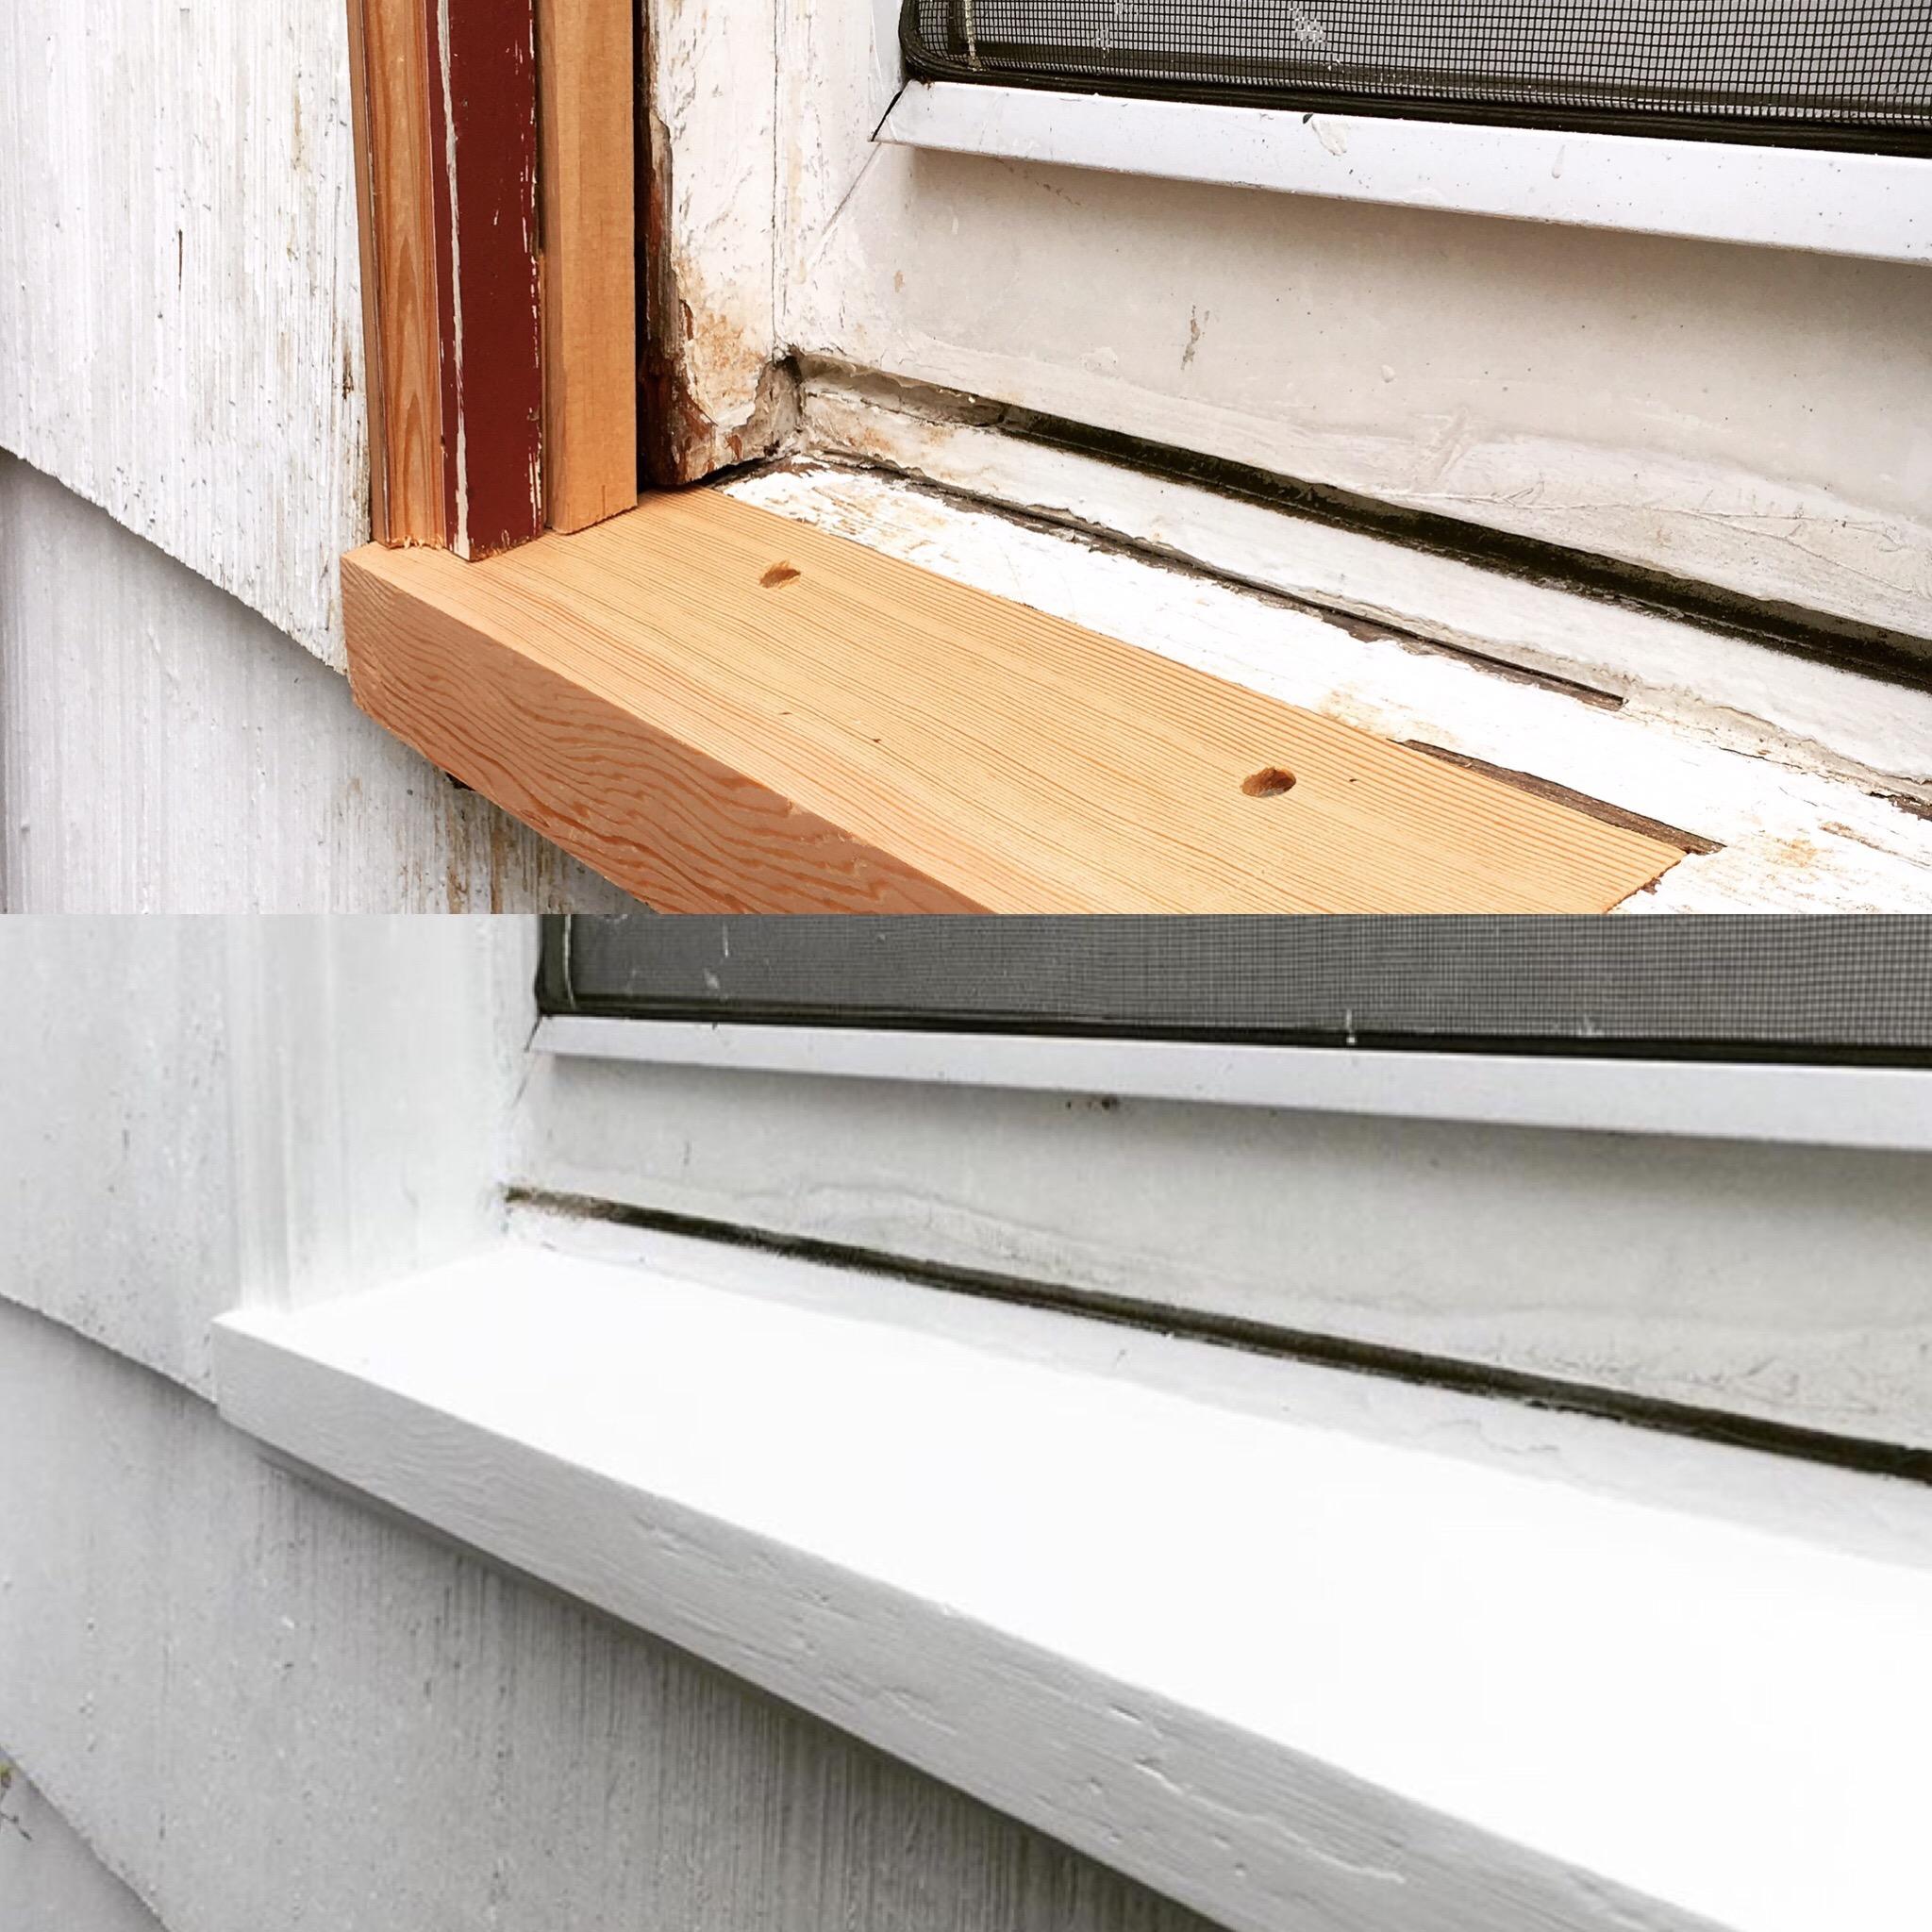 Exterior weather damage repair